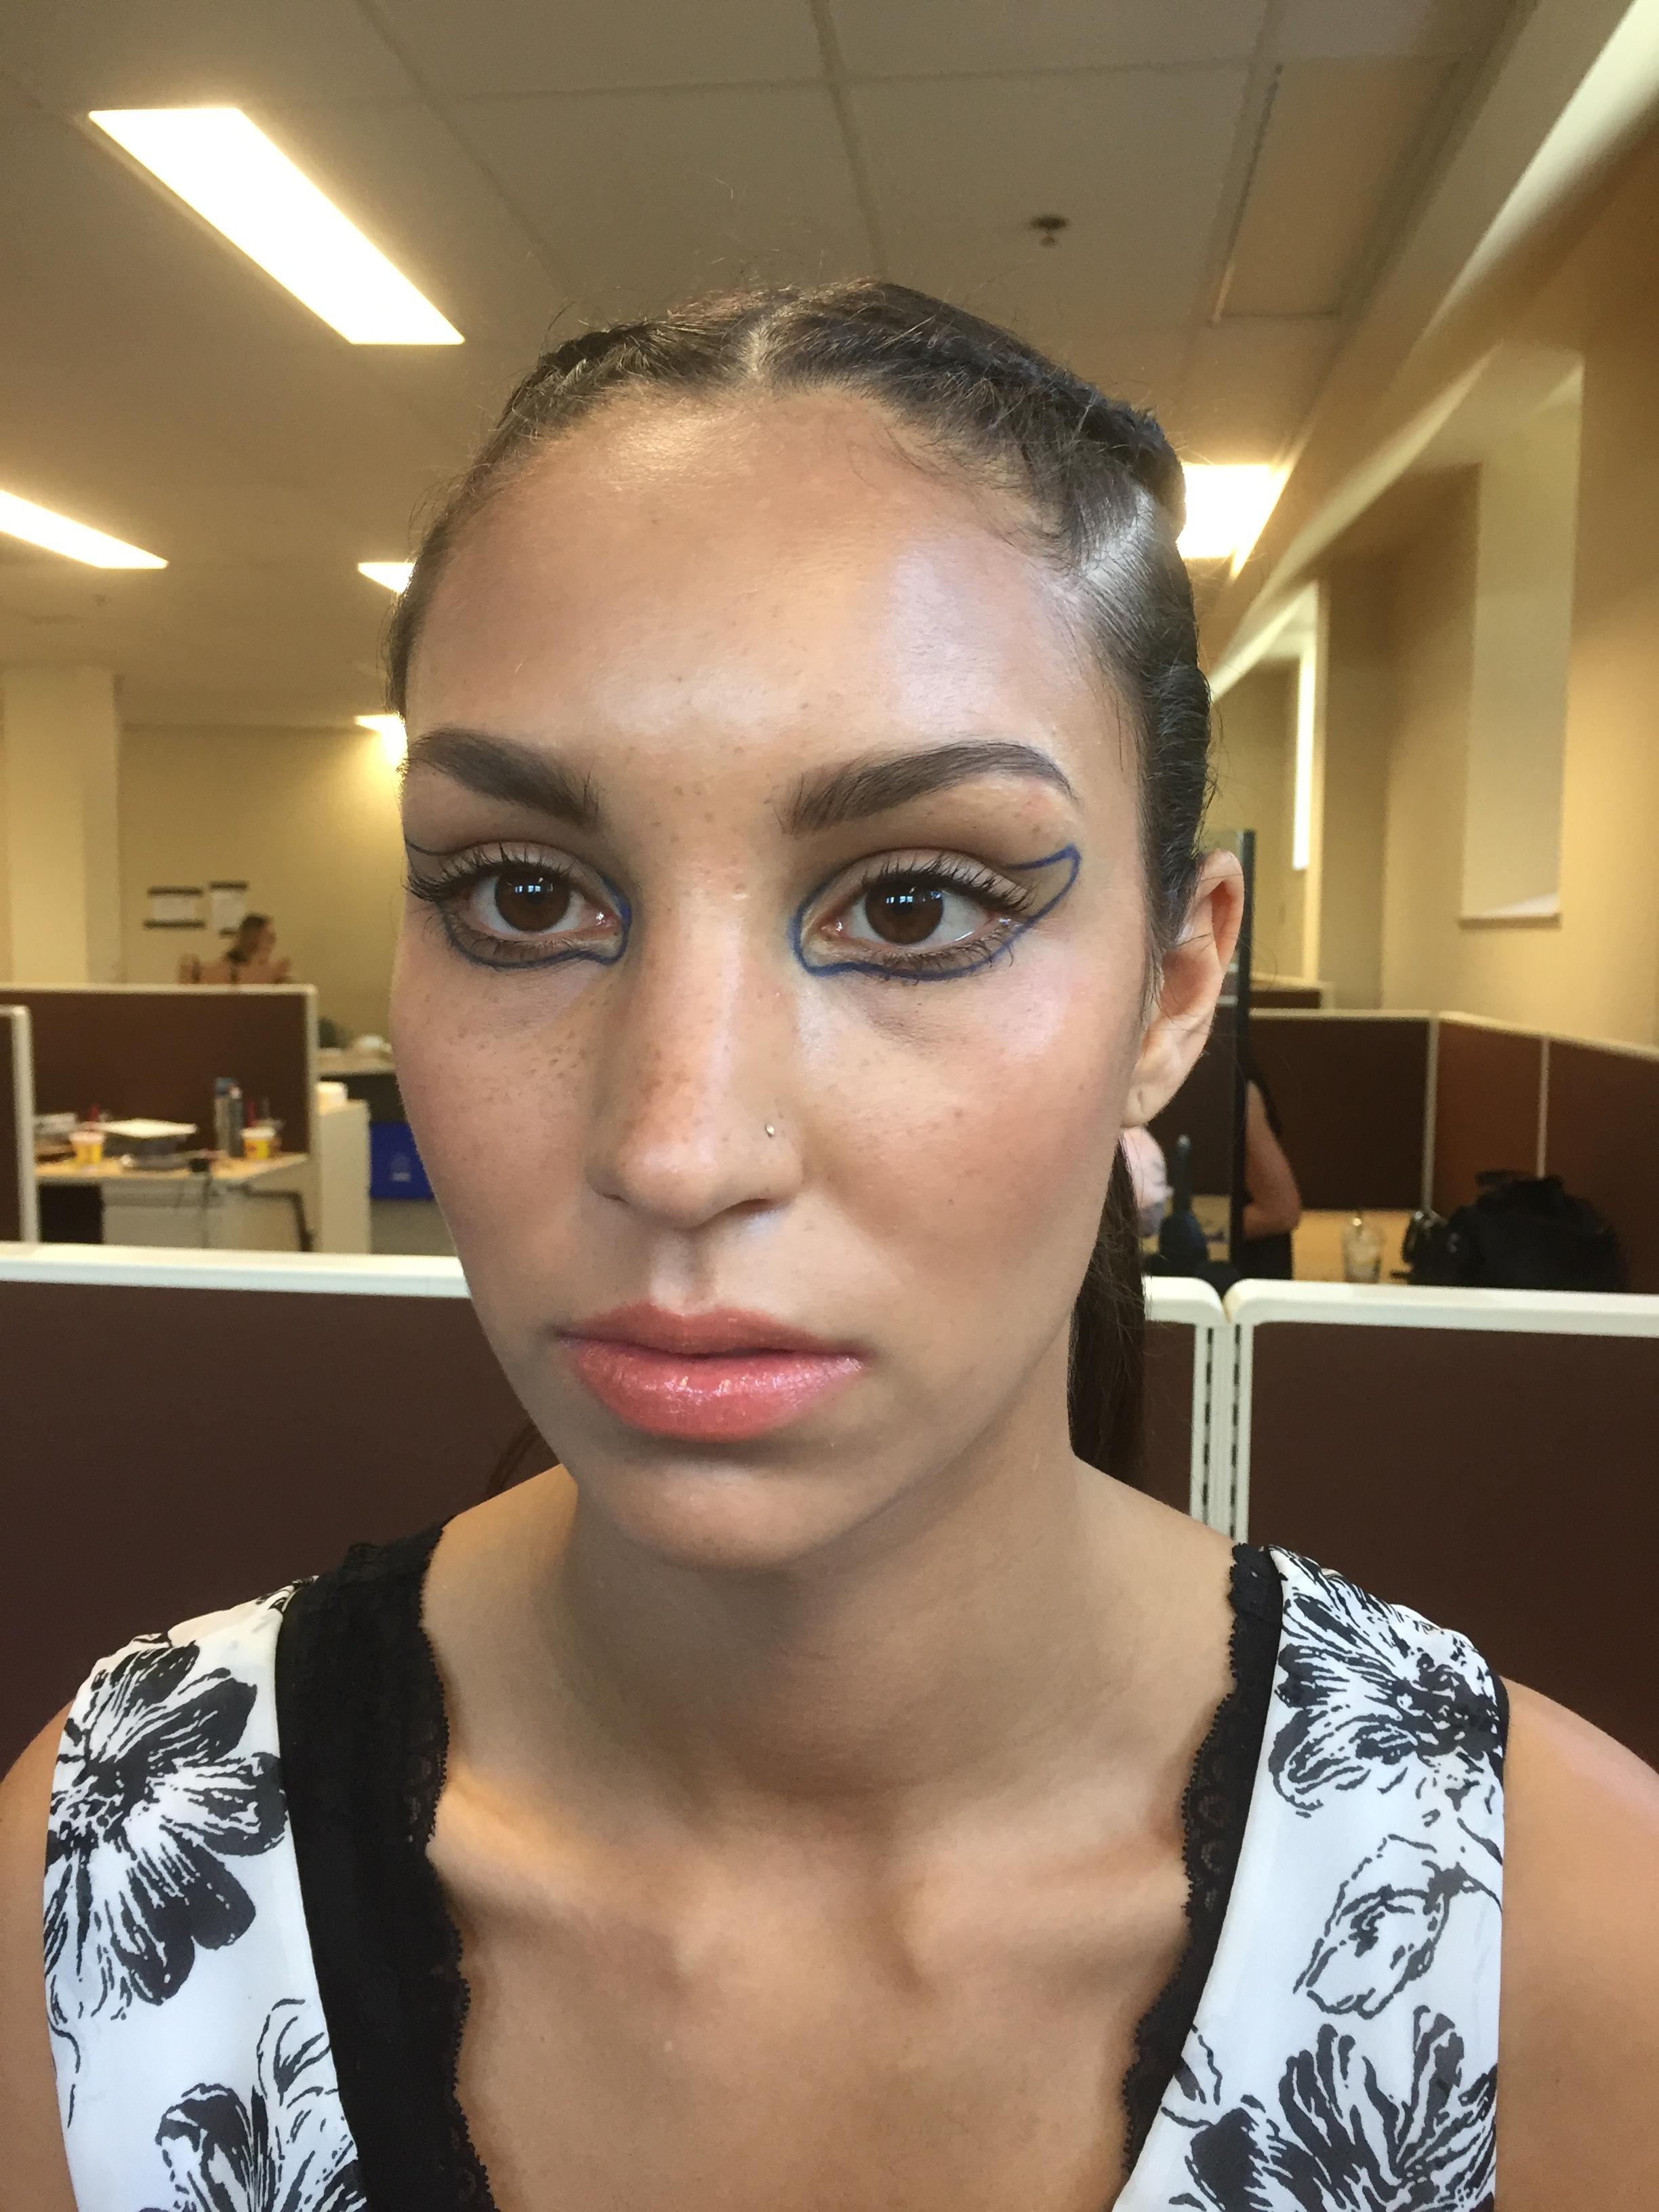 Saskatchewan Fashion Week 2017  Makeup Look created by: Ginette Hall Makeup Artist  Executed by: Samantha Tran